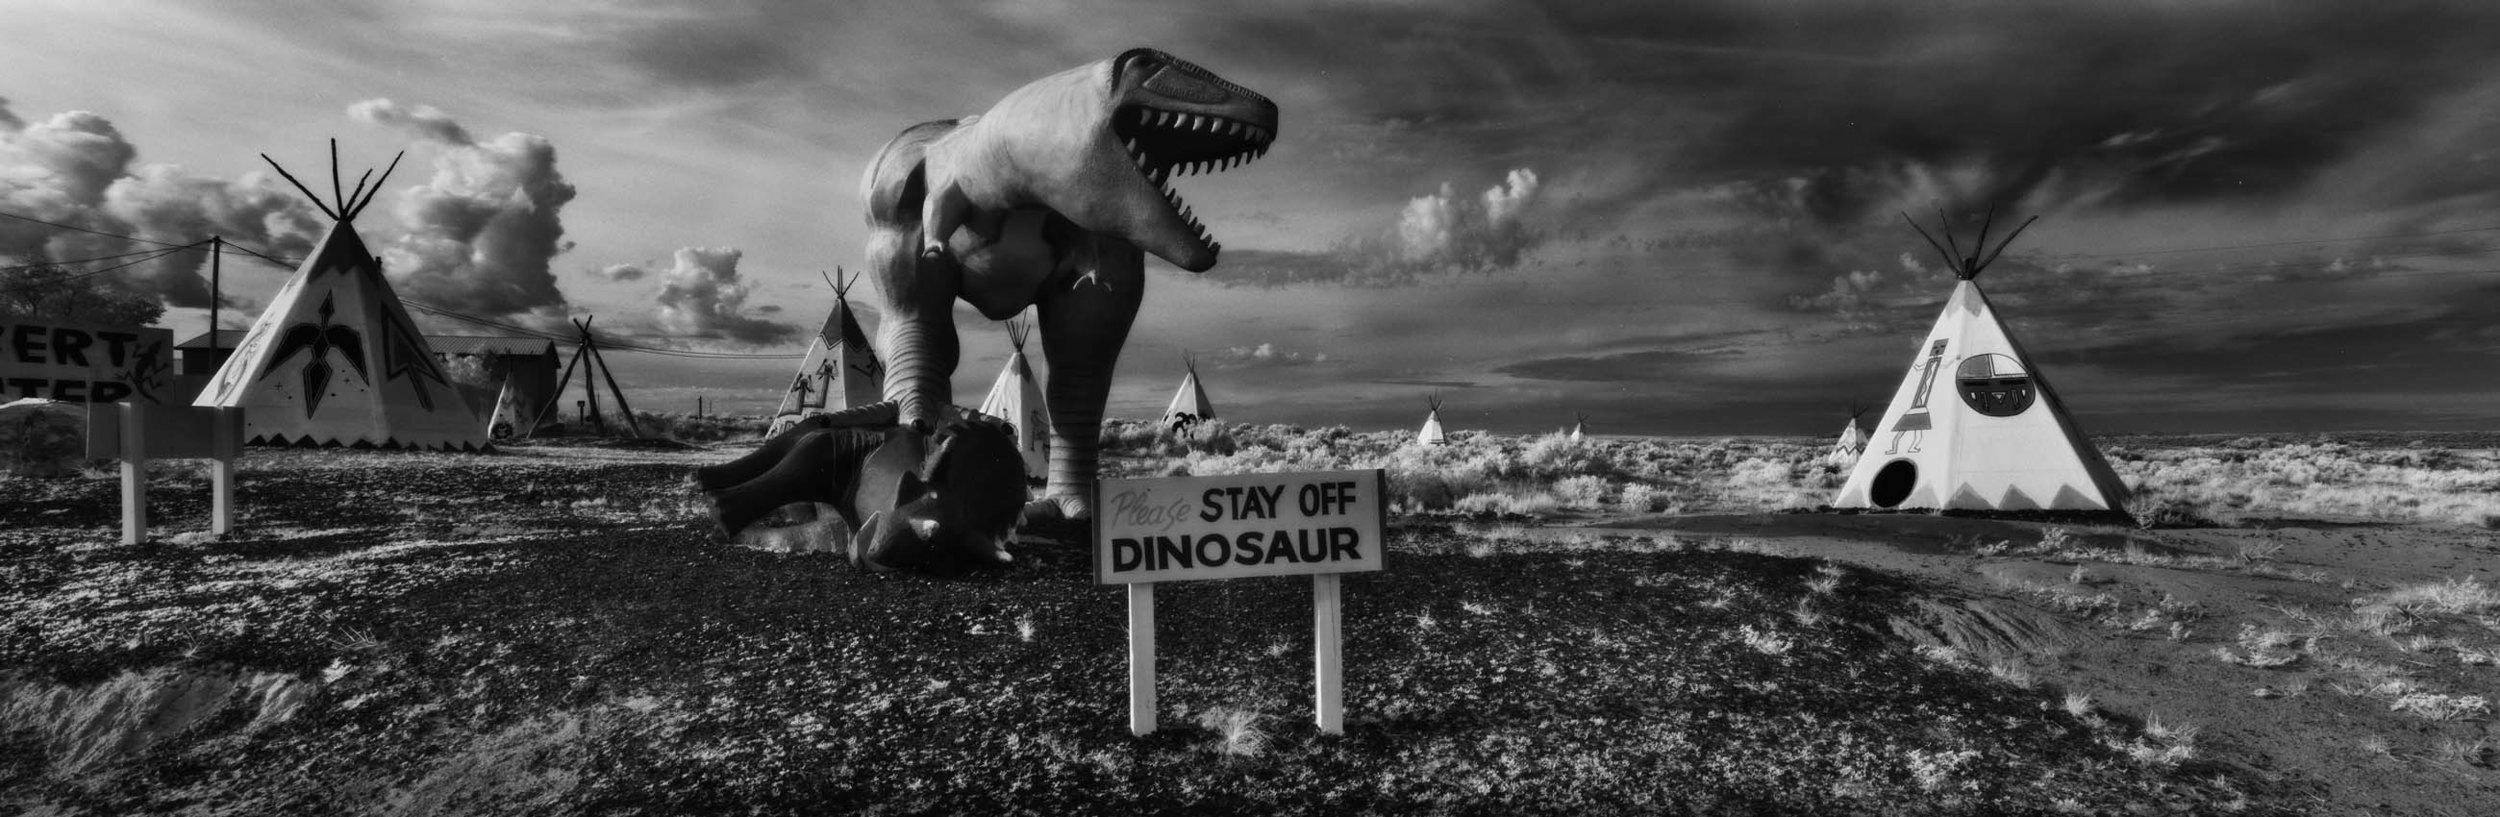 Route 66 Dino